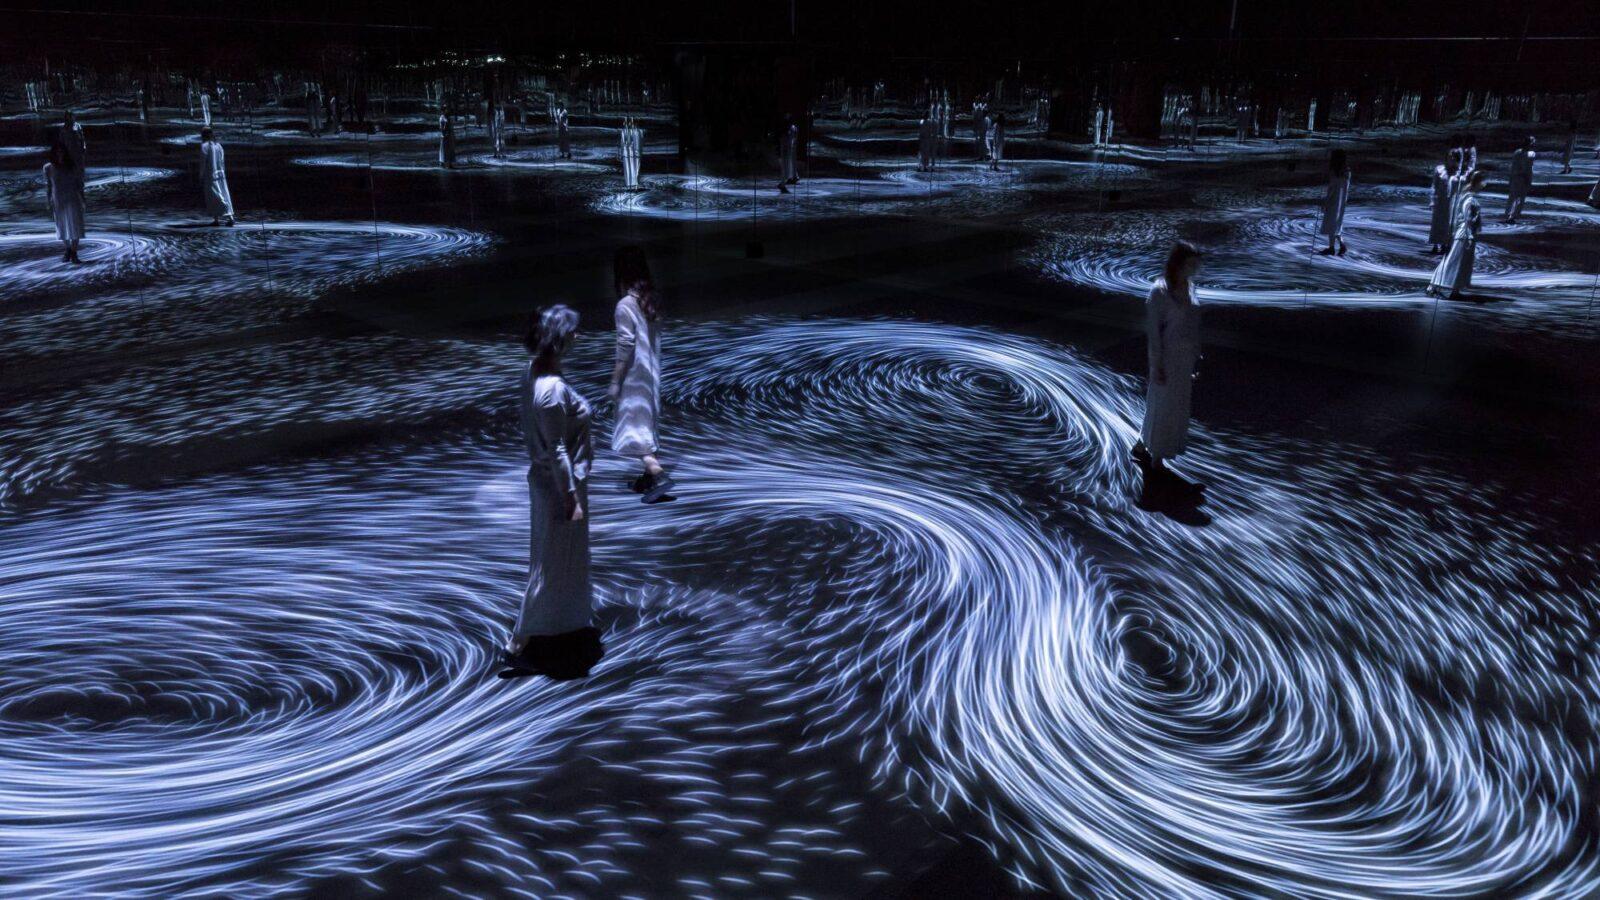 Ocean Wall Murals Step Inside A Swirling Mirror Room Of Interactive Ocean